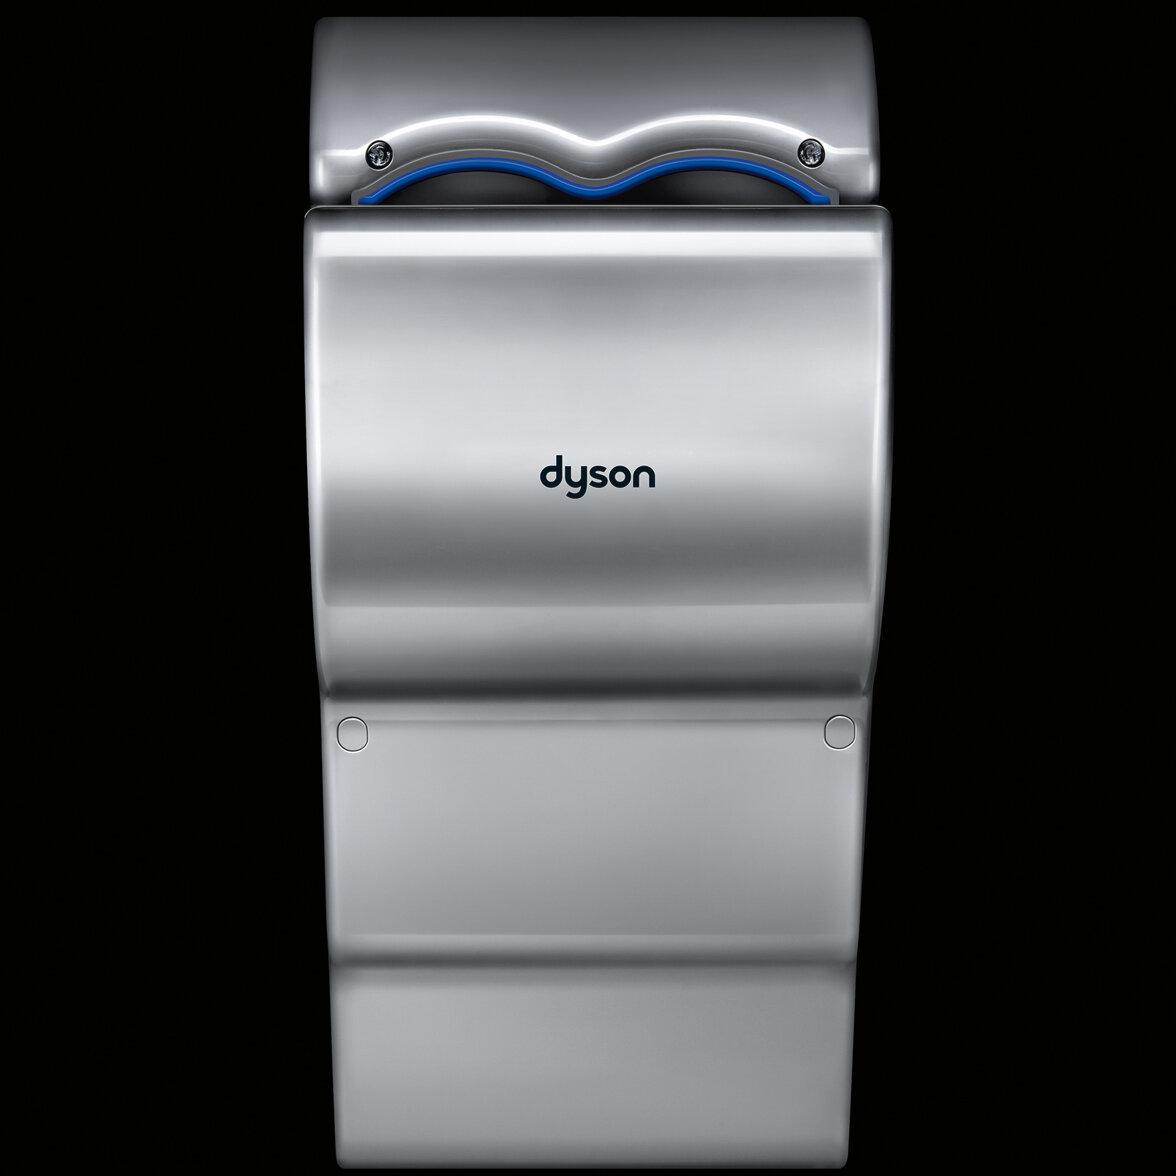 Dyson \